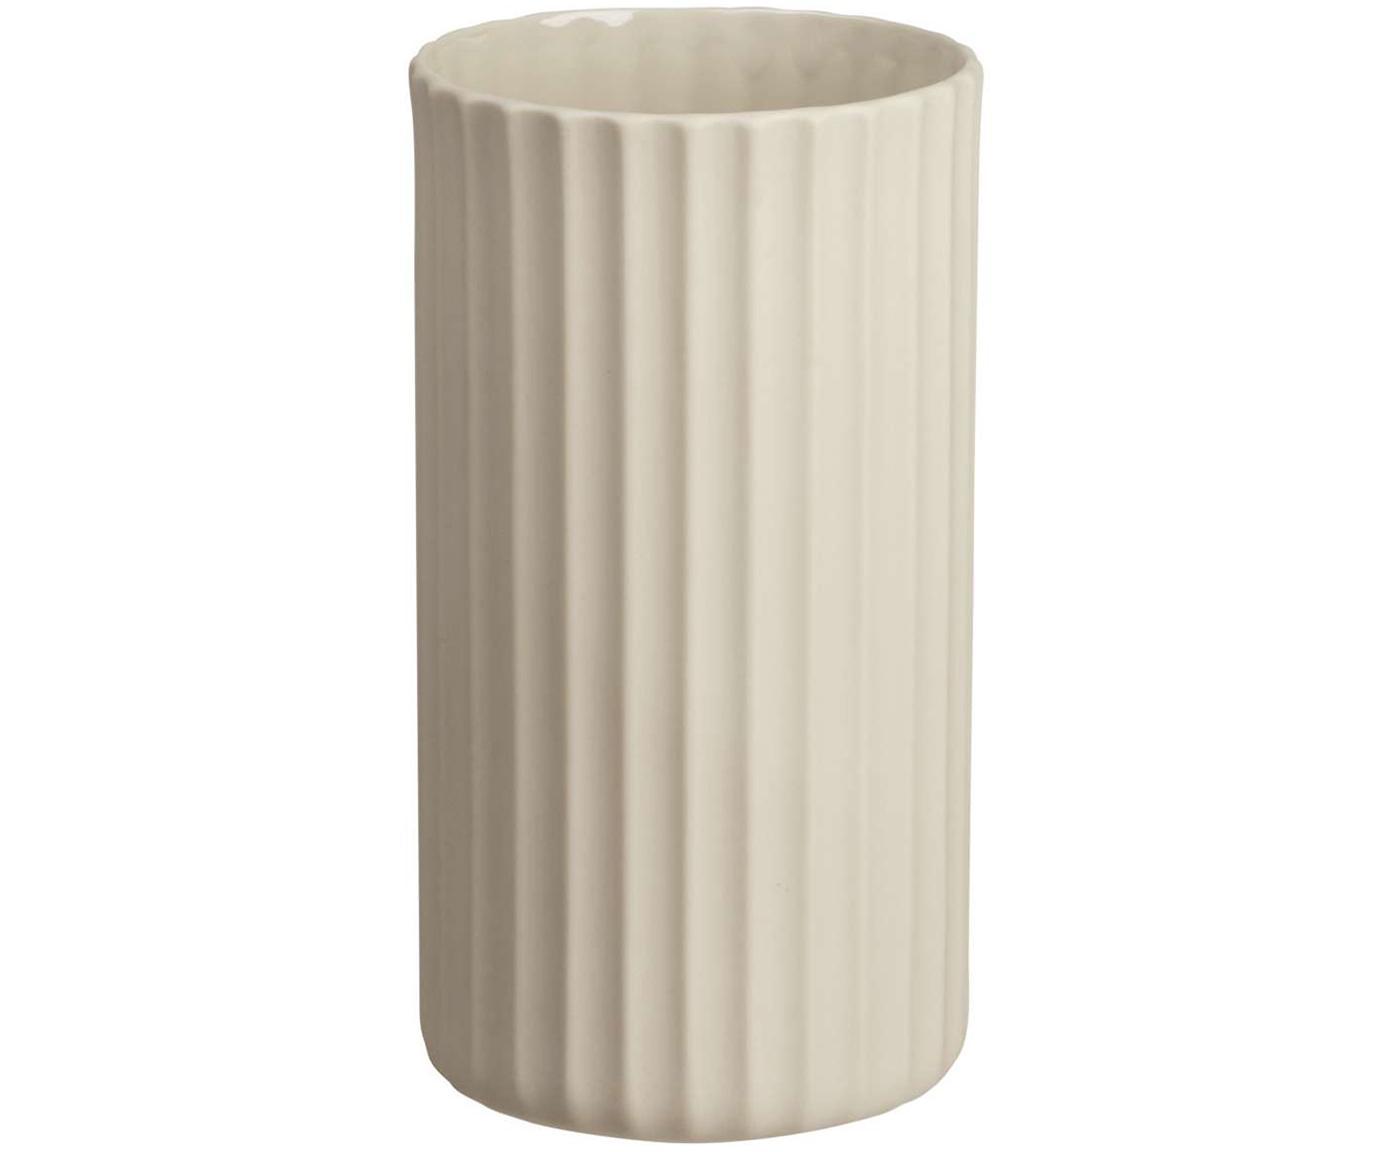 Jarrón artesanal de porcelana Yoko, Porcelana, Beige, Ø 9 x Al 16 cm